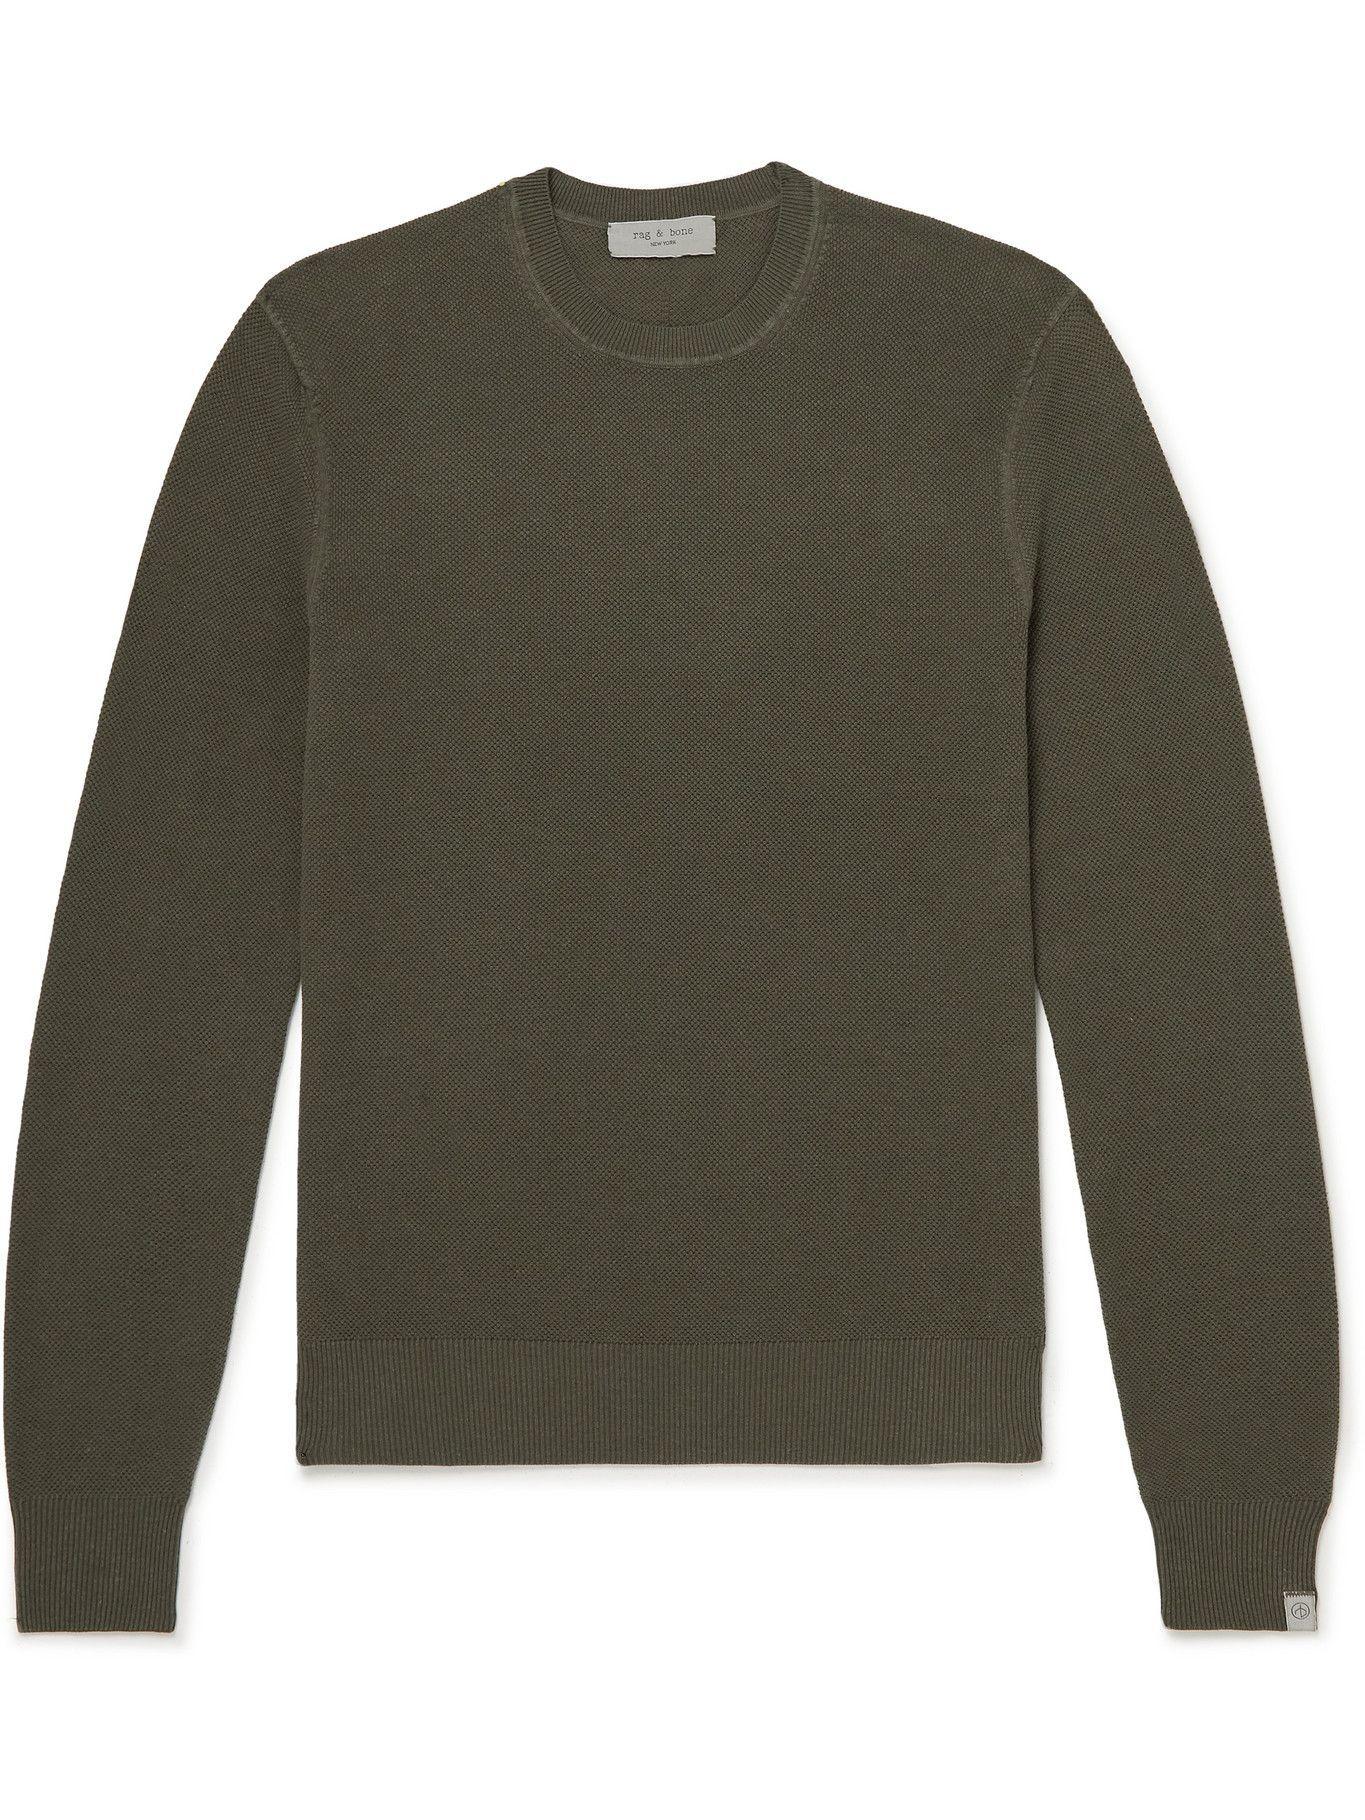 Photo: RAG & BONE - Cotton and Hemp-Blend Piqué Sweater - Green